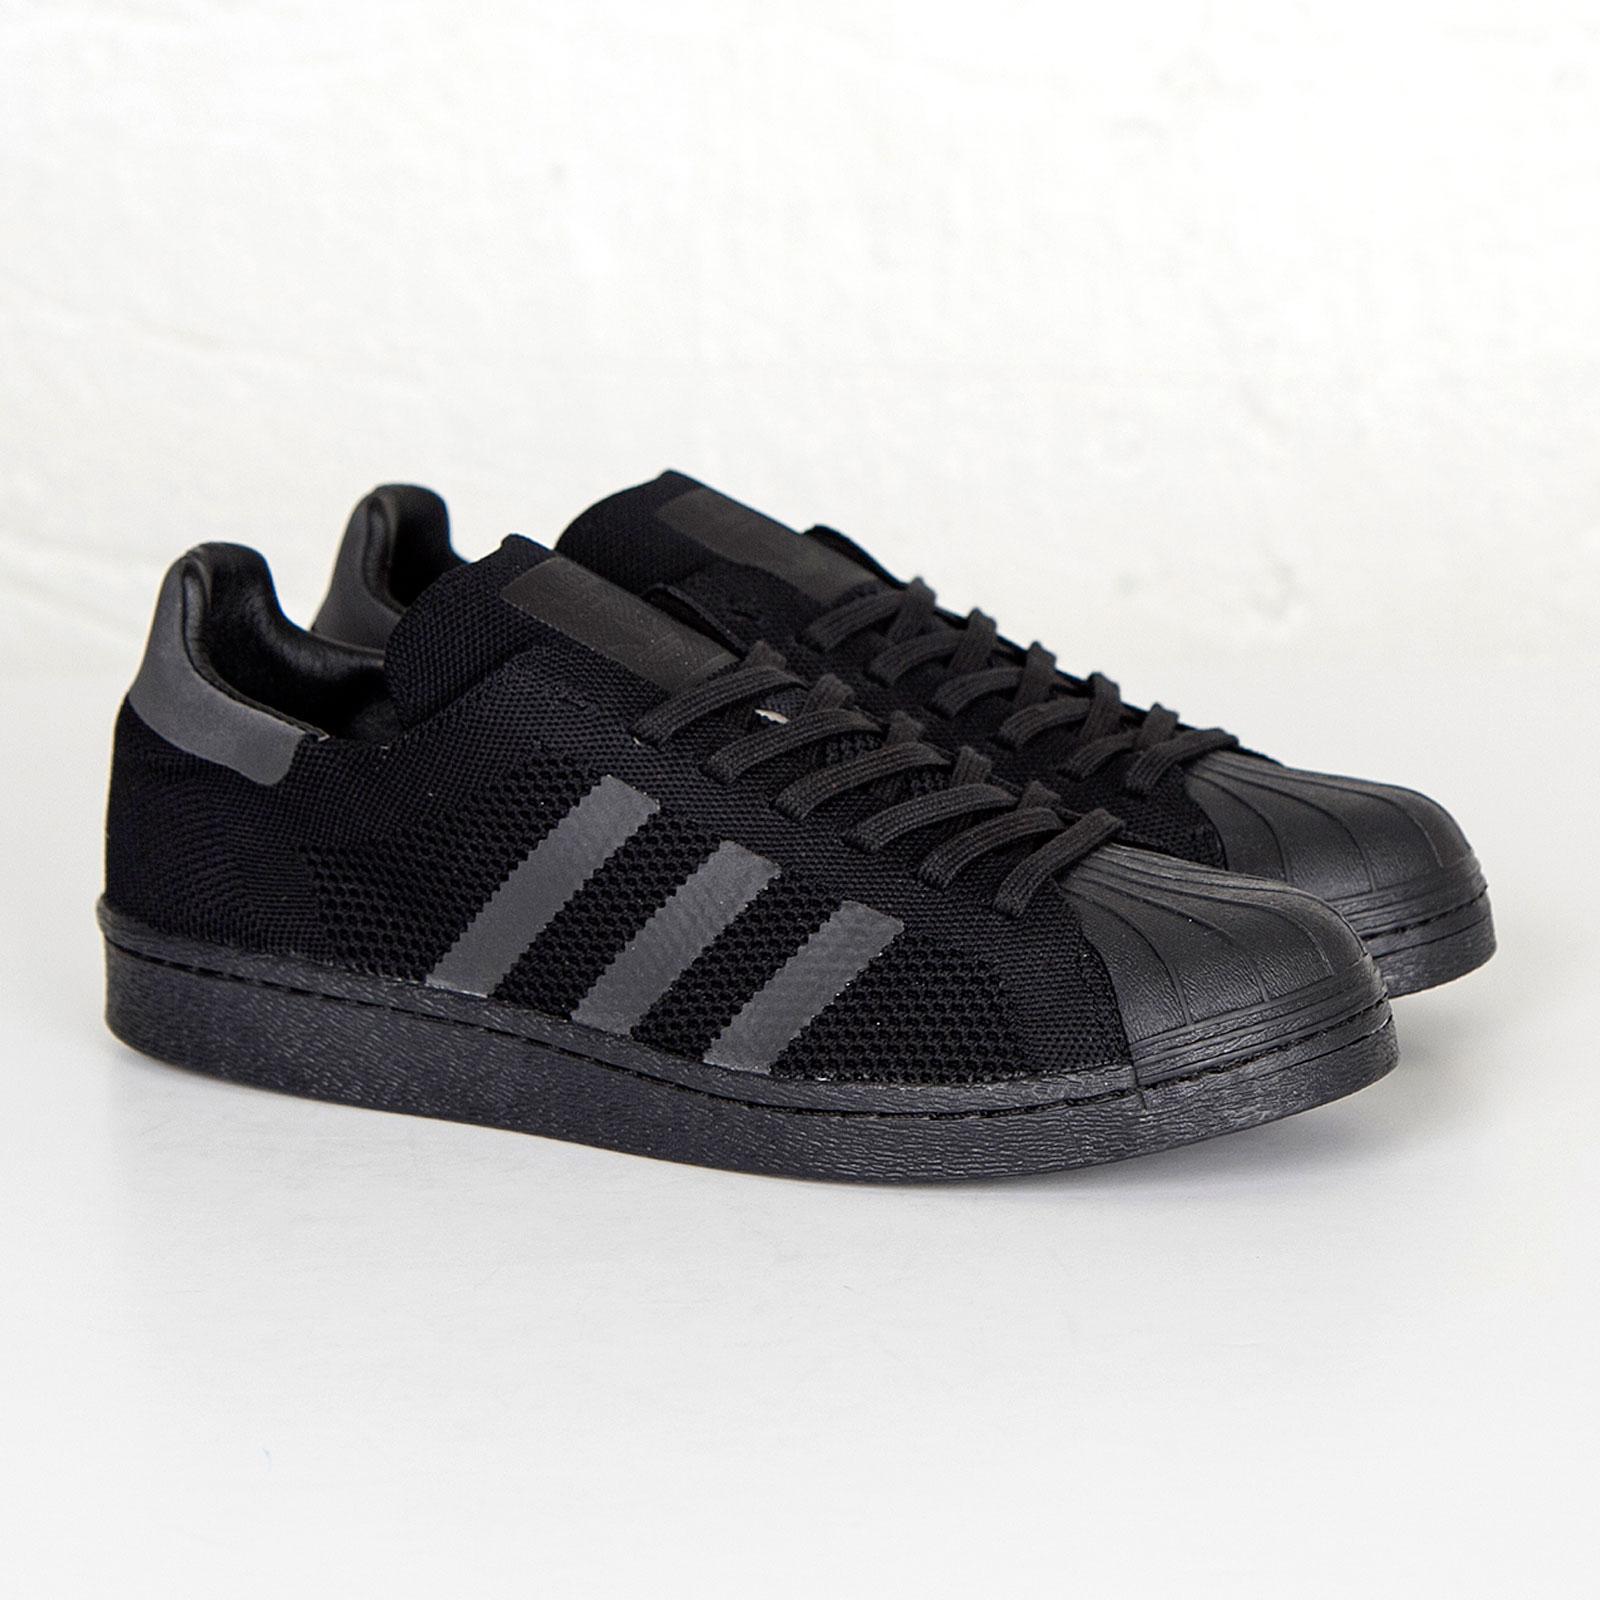 adidas Superstar 80s Primeknit Aq4814 Sneakersnstuff